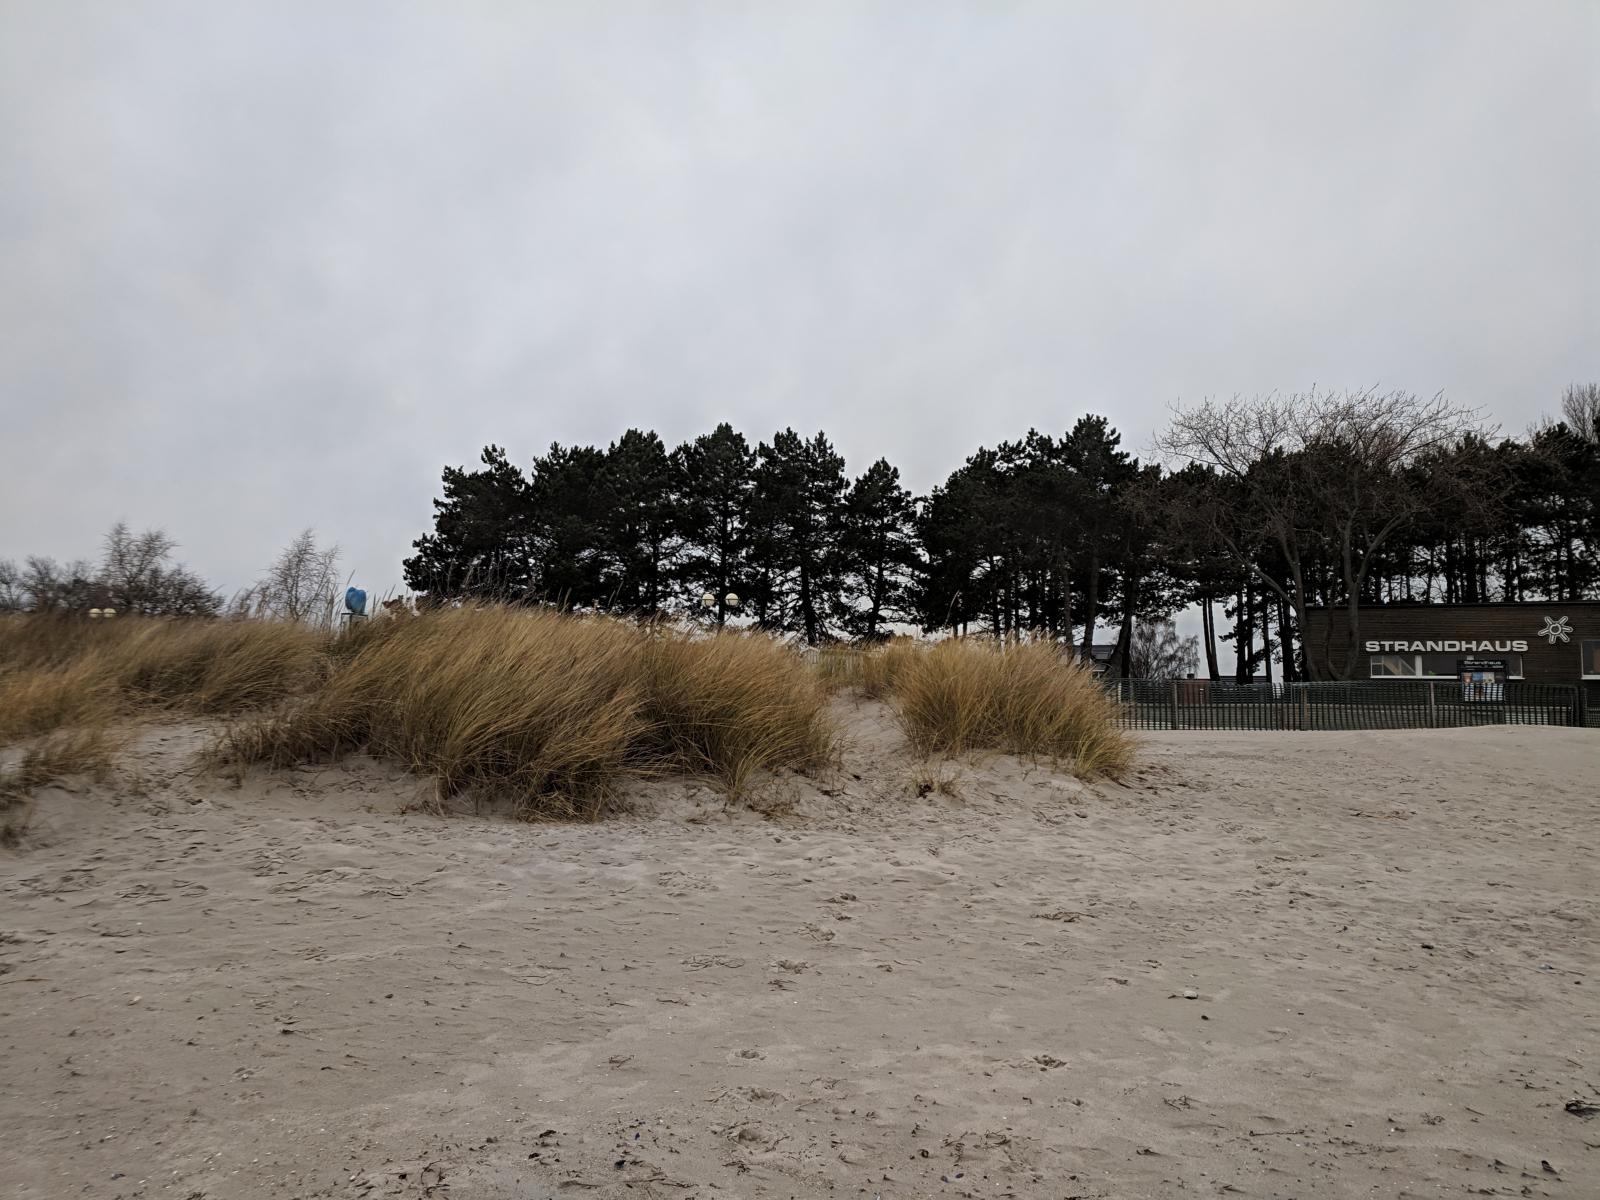 annaporter-baltic-sea-grömitz-9.jpg